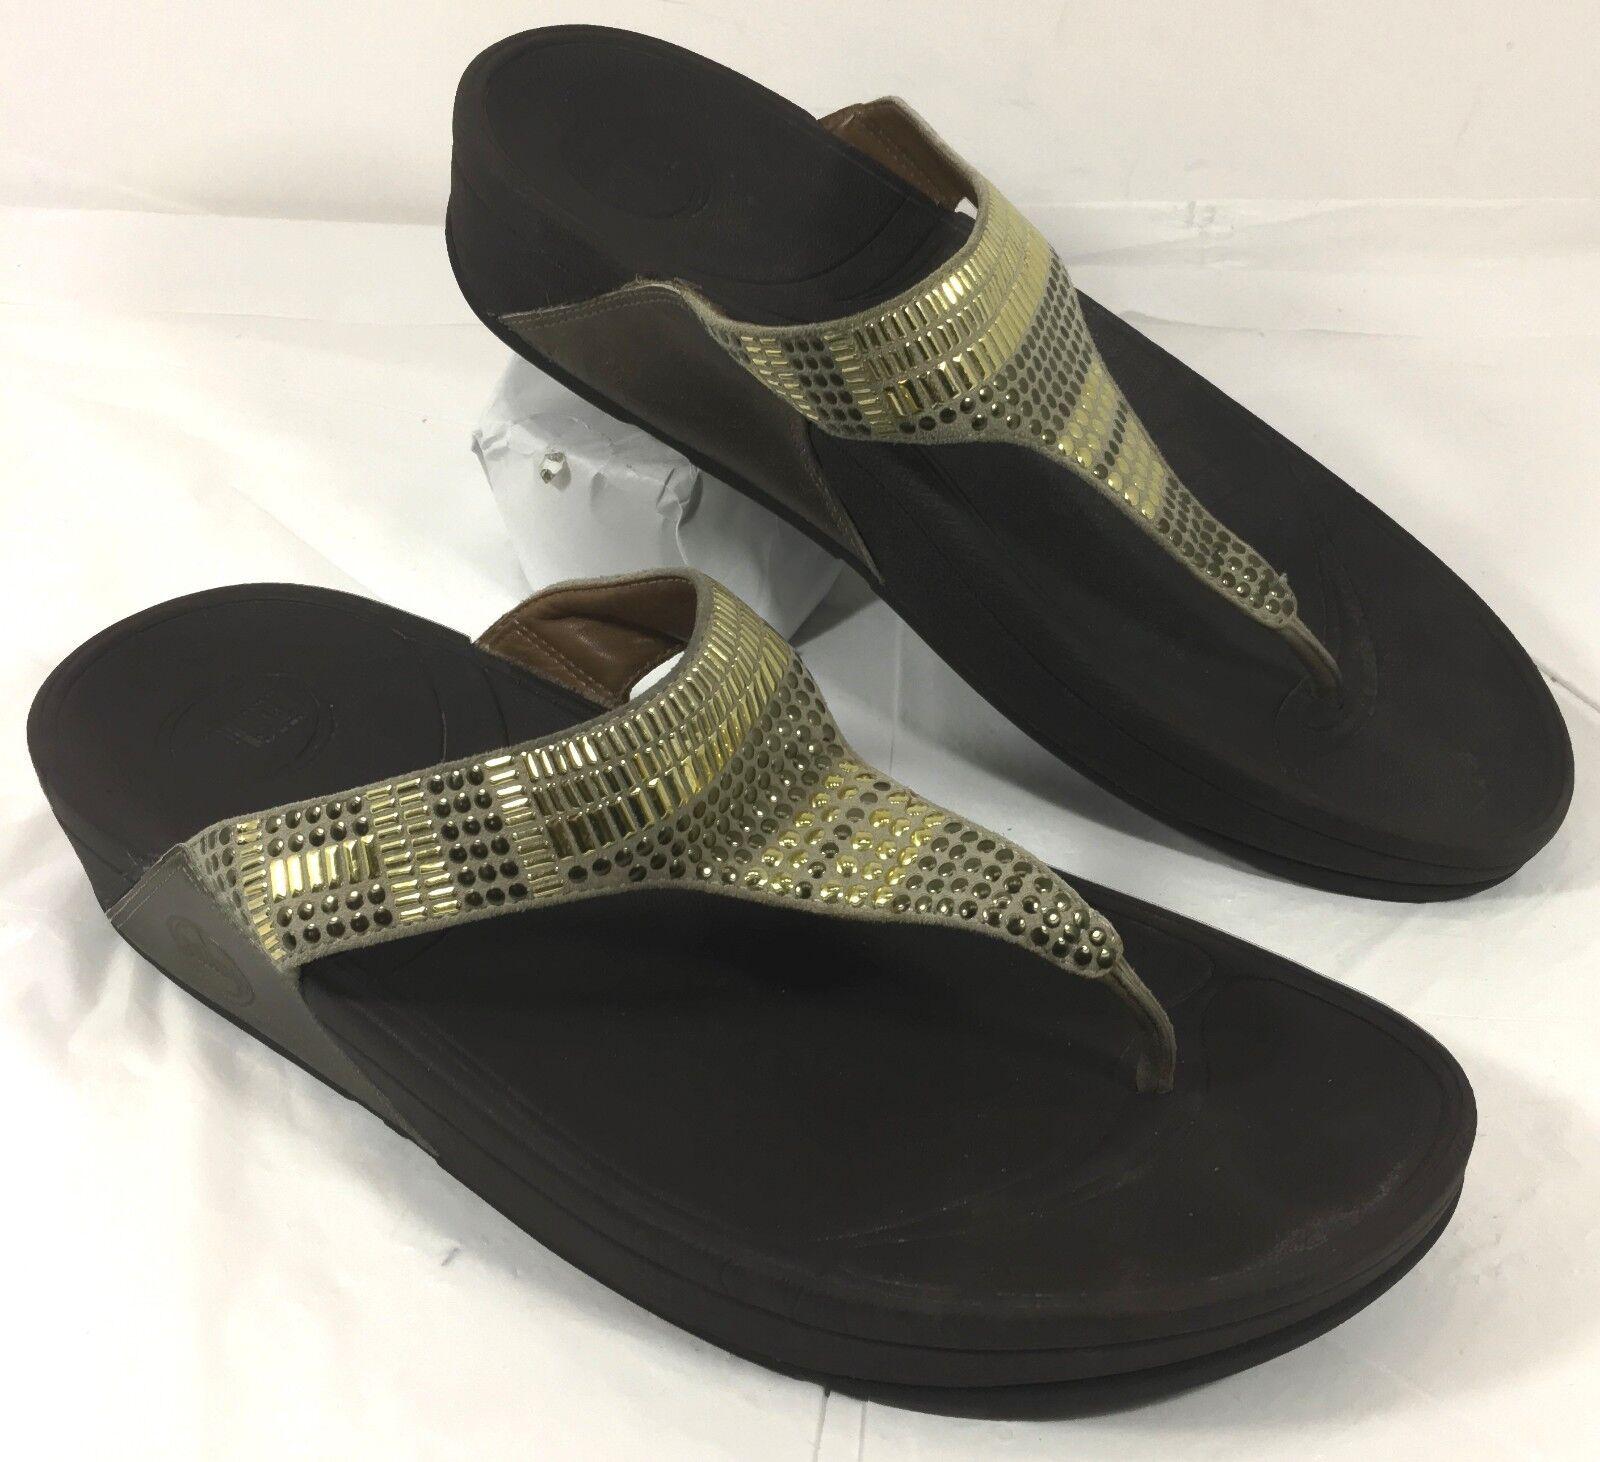 GUC Women's FitFlop Aztec Chada Flip Flops Gold Studs Sz 10